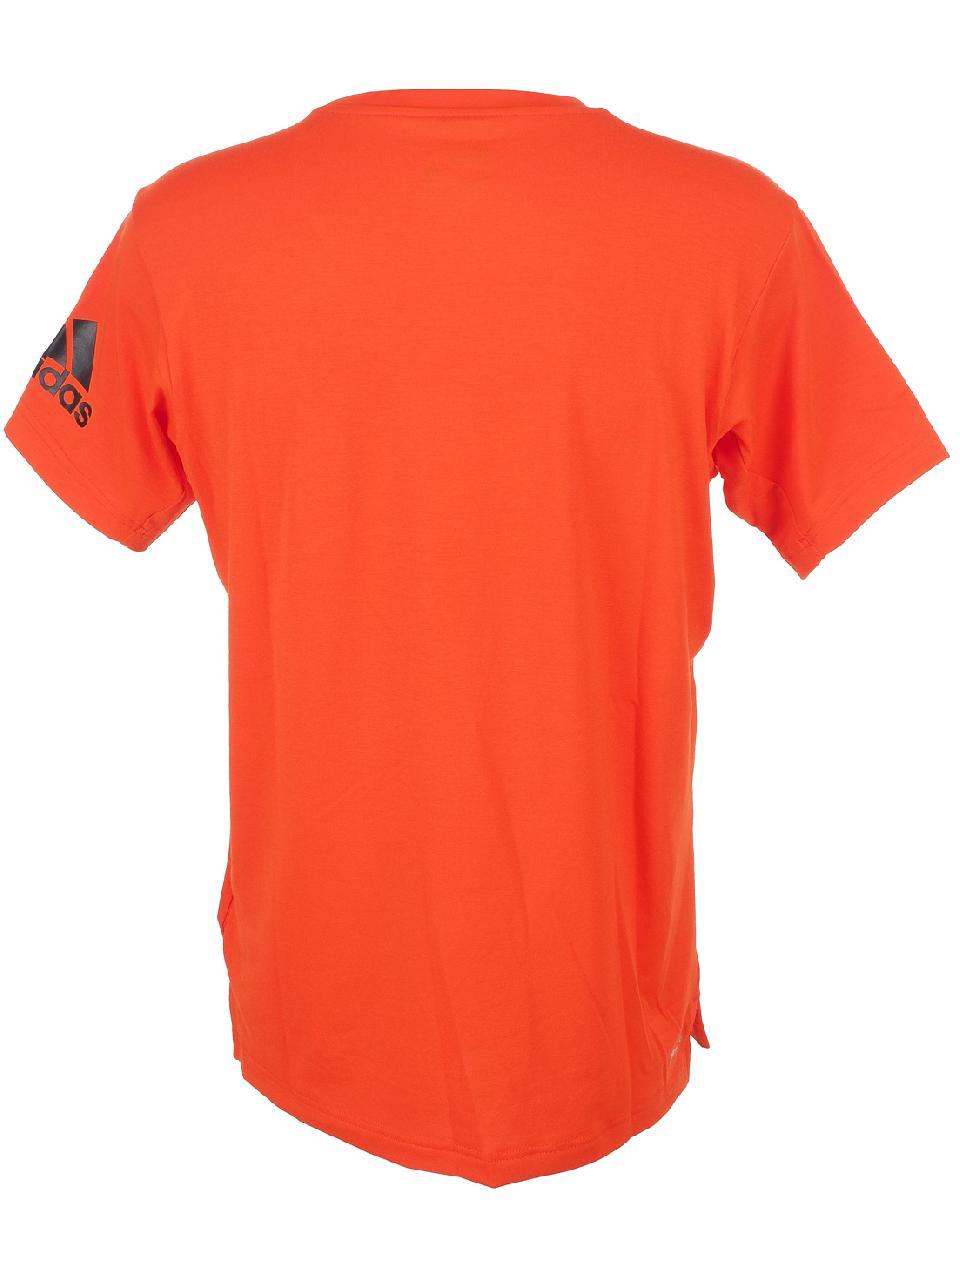 Short-Sleeve-T-Shirt-Adidas-Freelift-Premium-Rge-Mc-Tee-Red-50082-New thumbnail 4